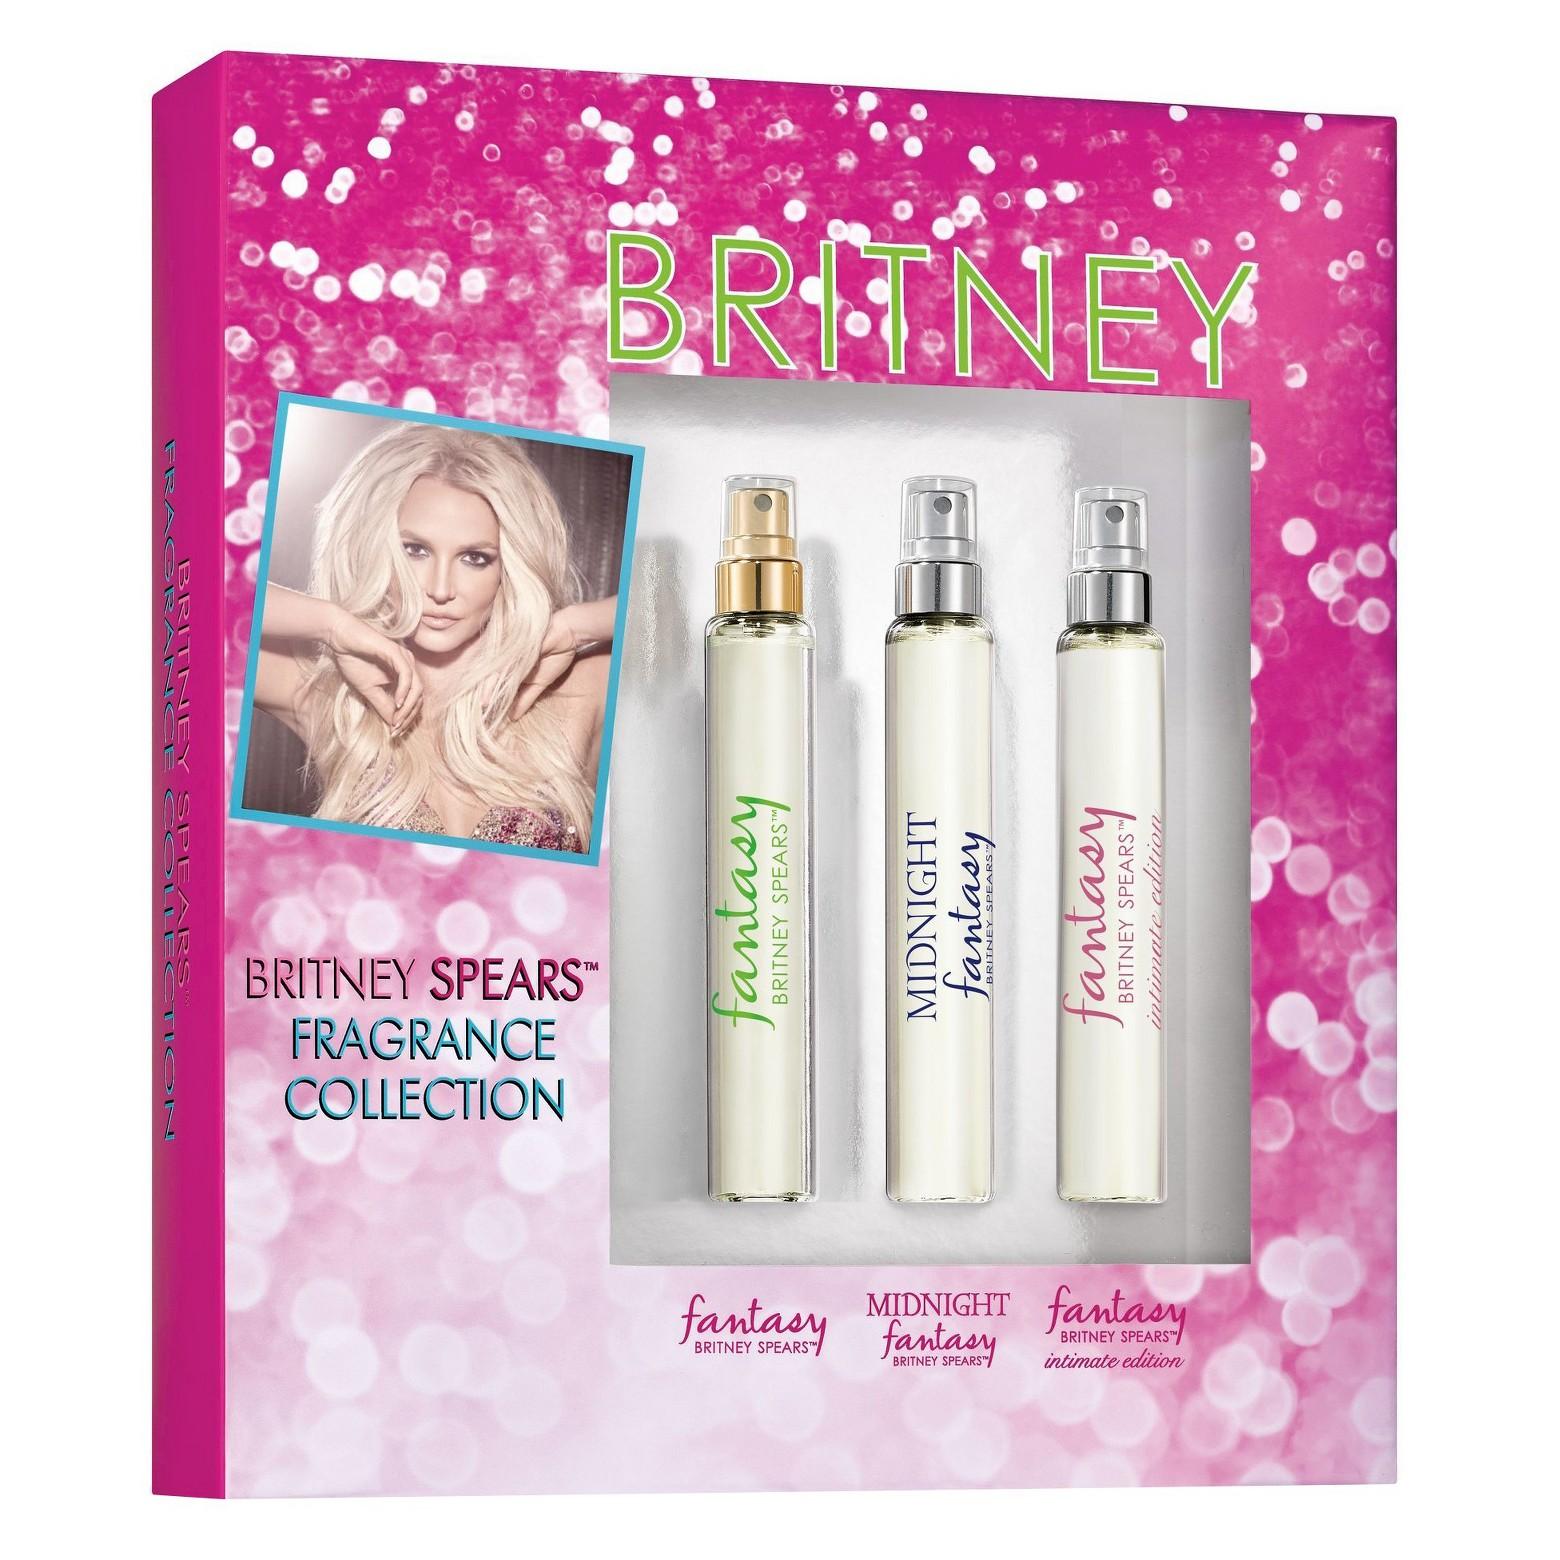 Britney Spears Fragrance Sampler Stocking Stuffer - 3 Pieces  $21.99 at Target.com